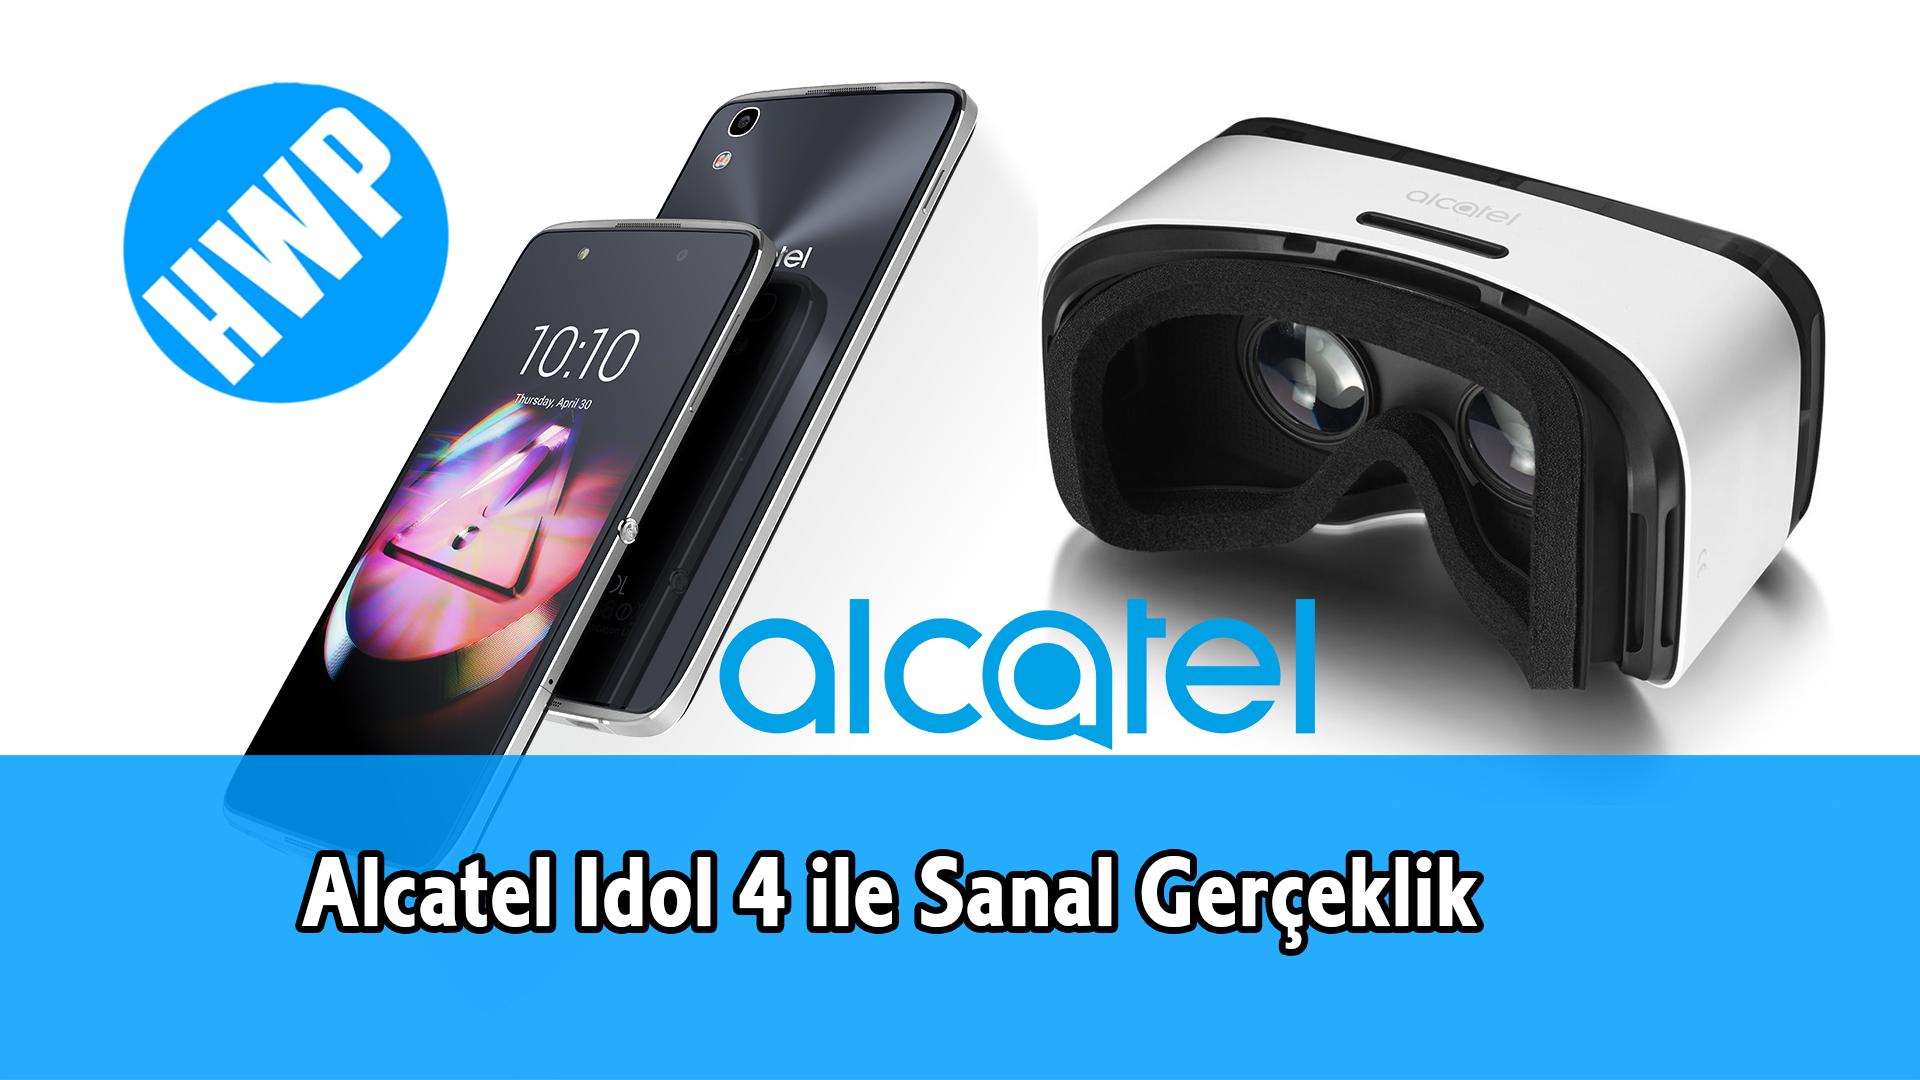 alcatel idol 4 sanal gerçeklik vr headset